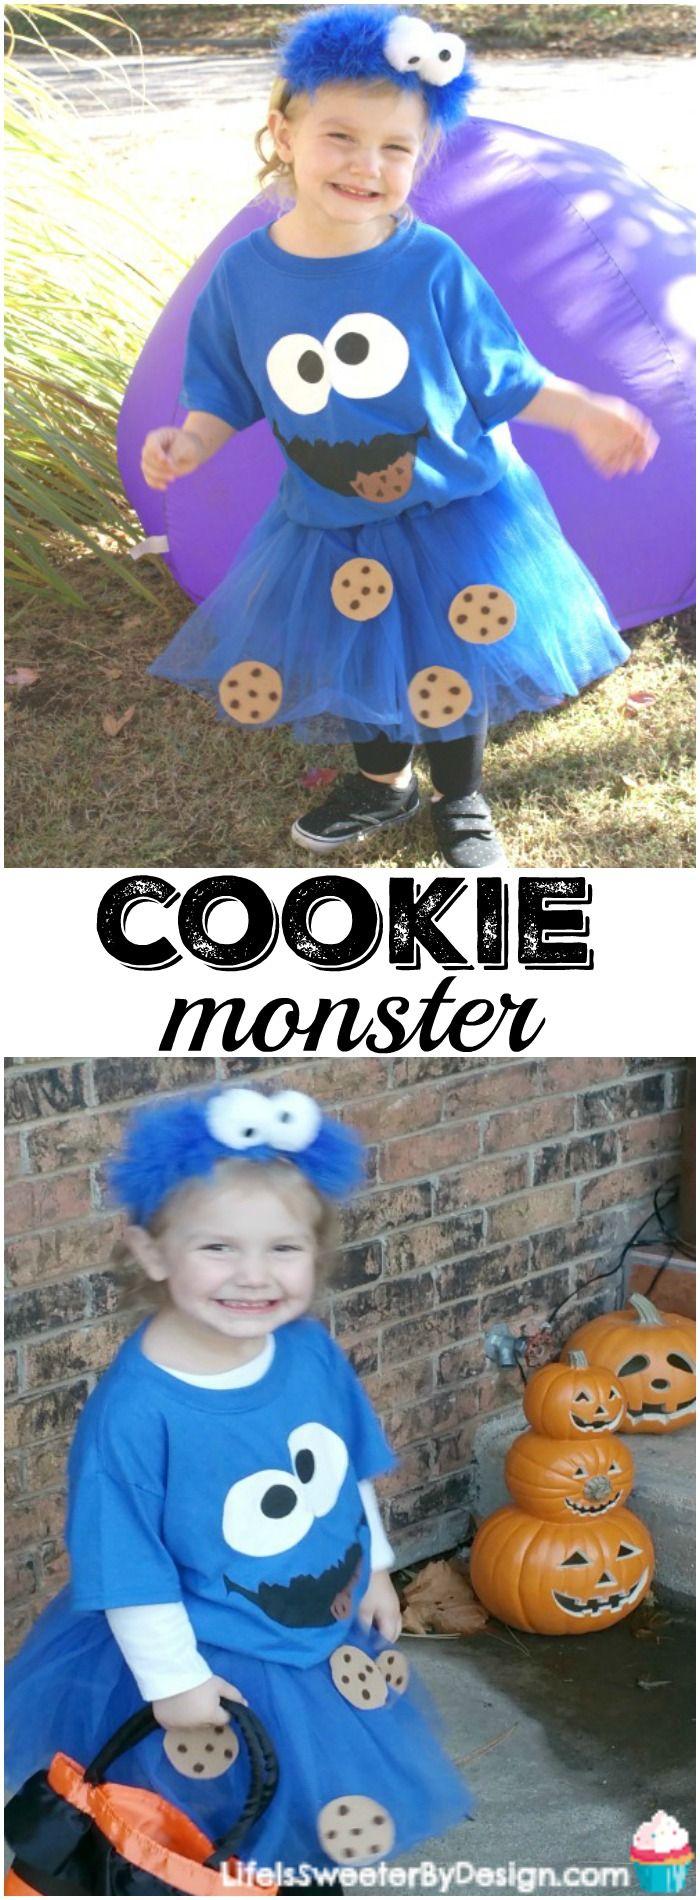 Best 25+ Cookie monster costumes ideas on Pinterest | Monster ...